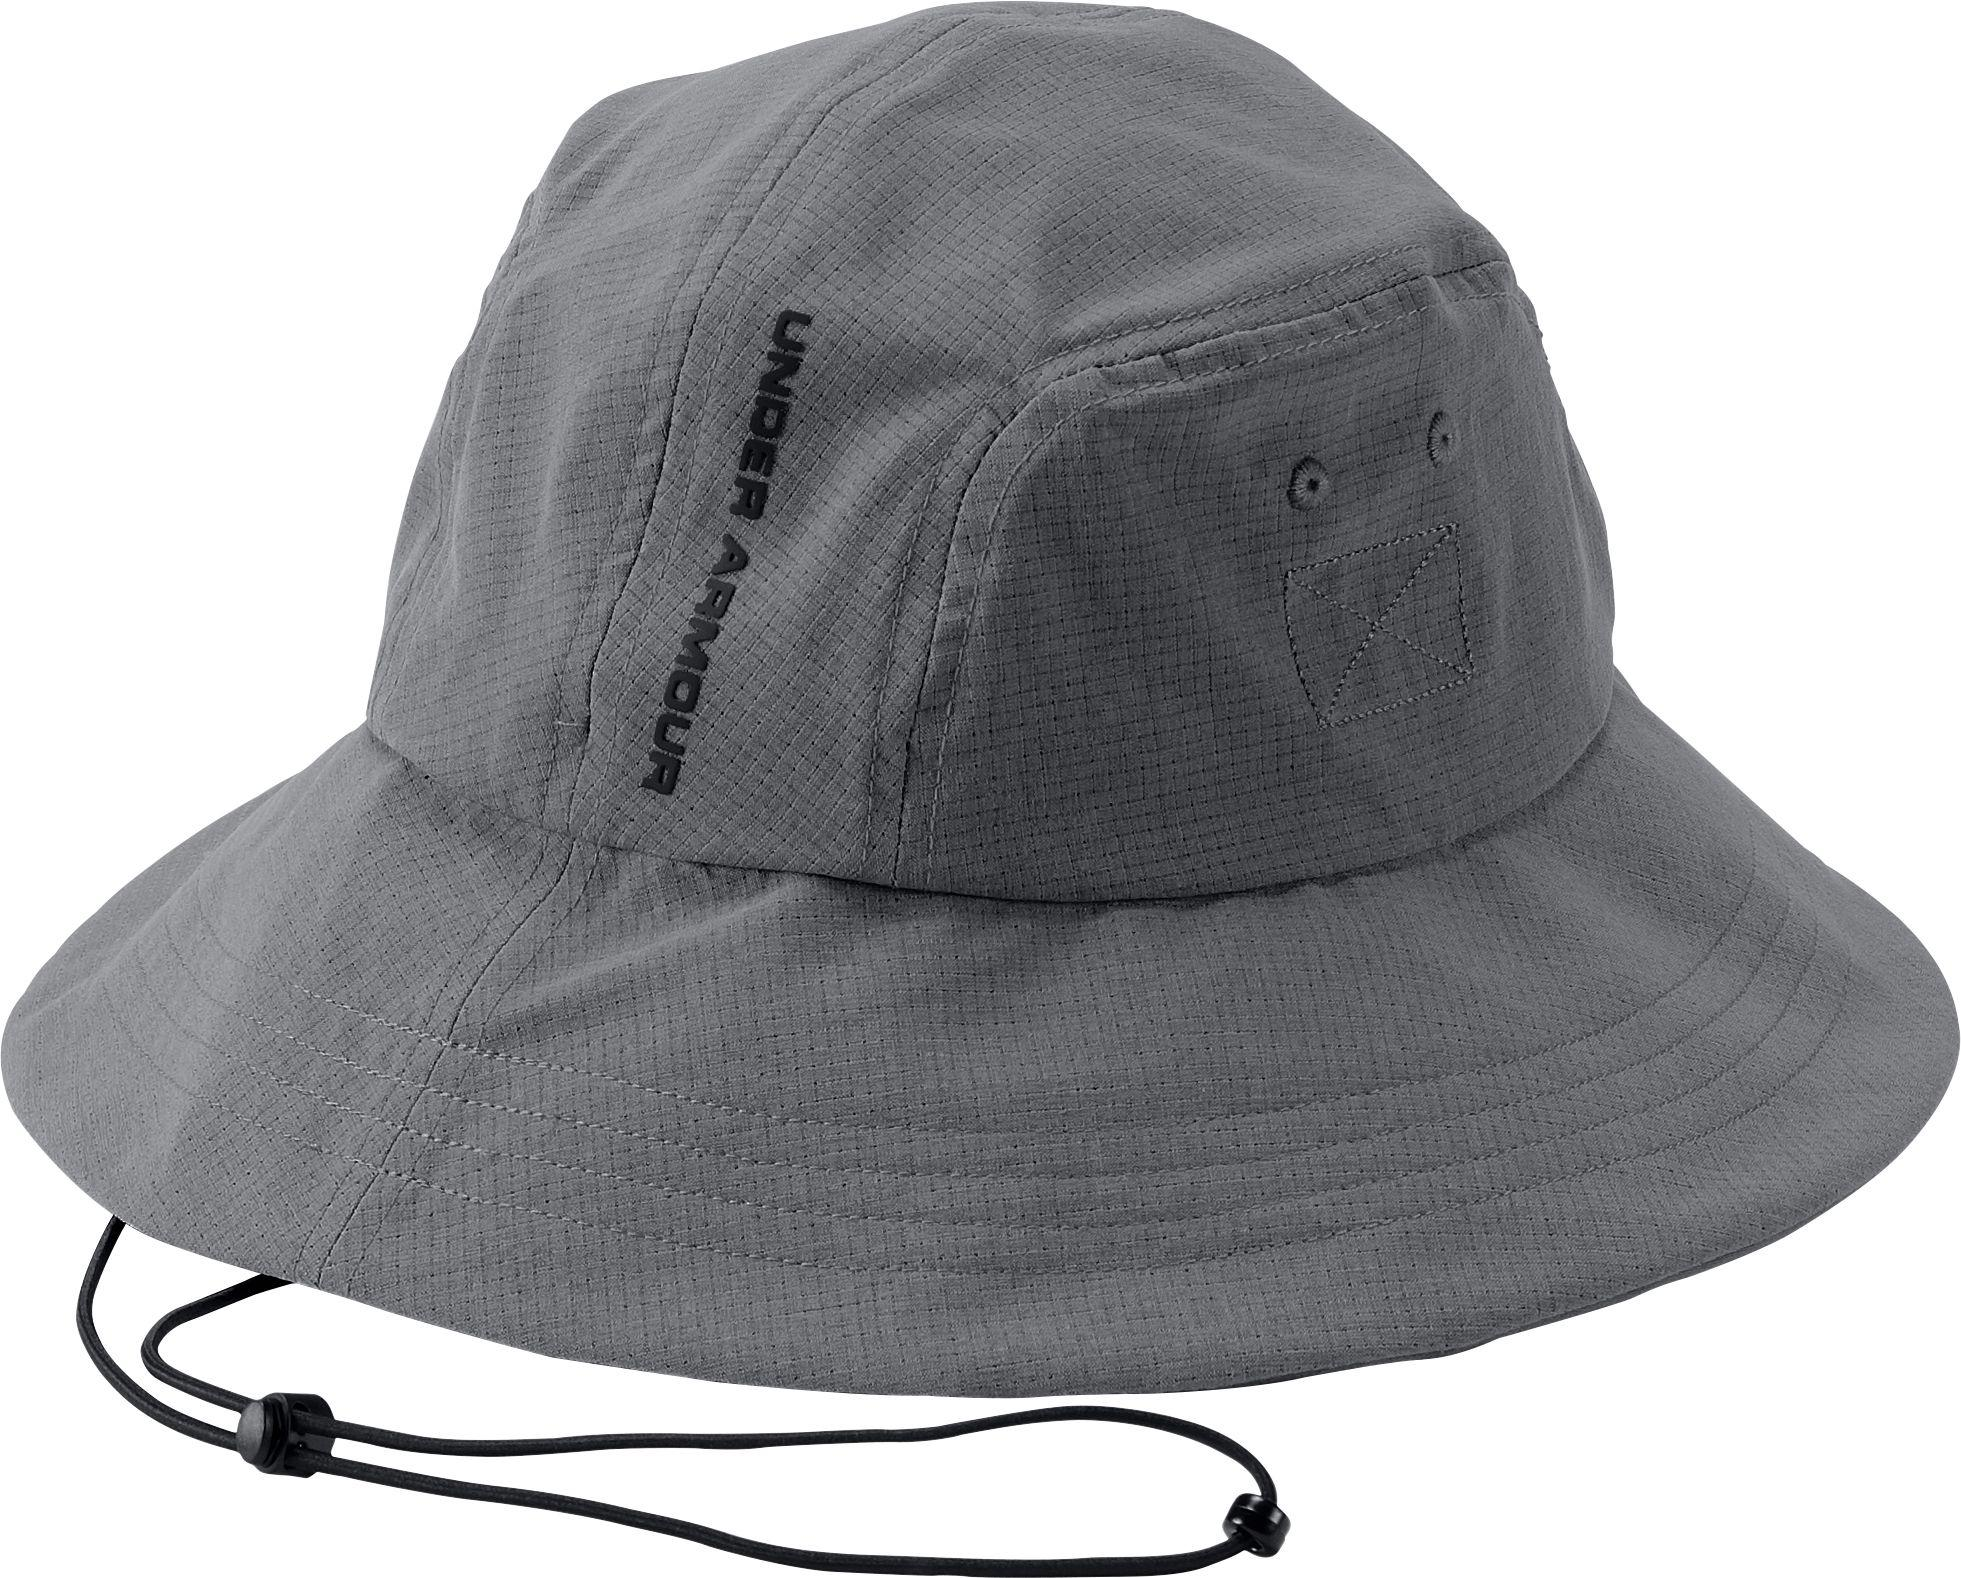 acca6c72dd4 Lyst - Under Armour Armourvent Warrior 2.0 Bucket Hat in Black for Men